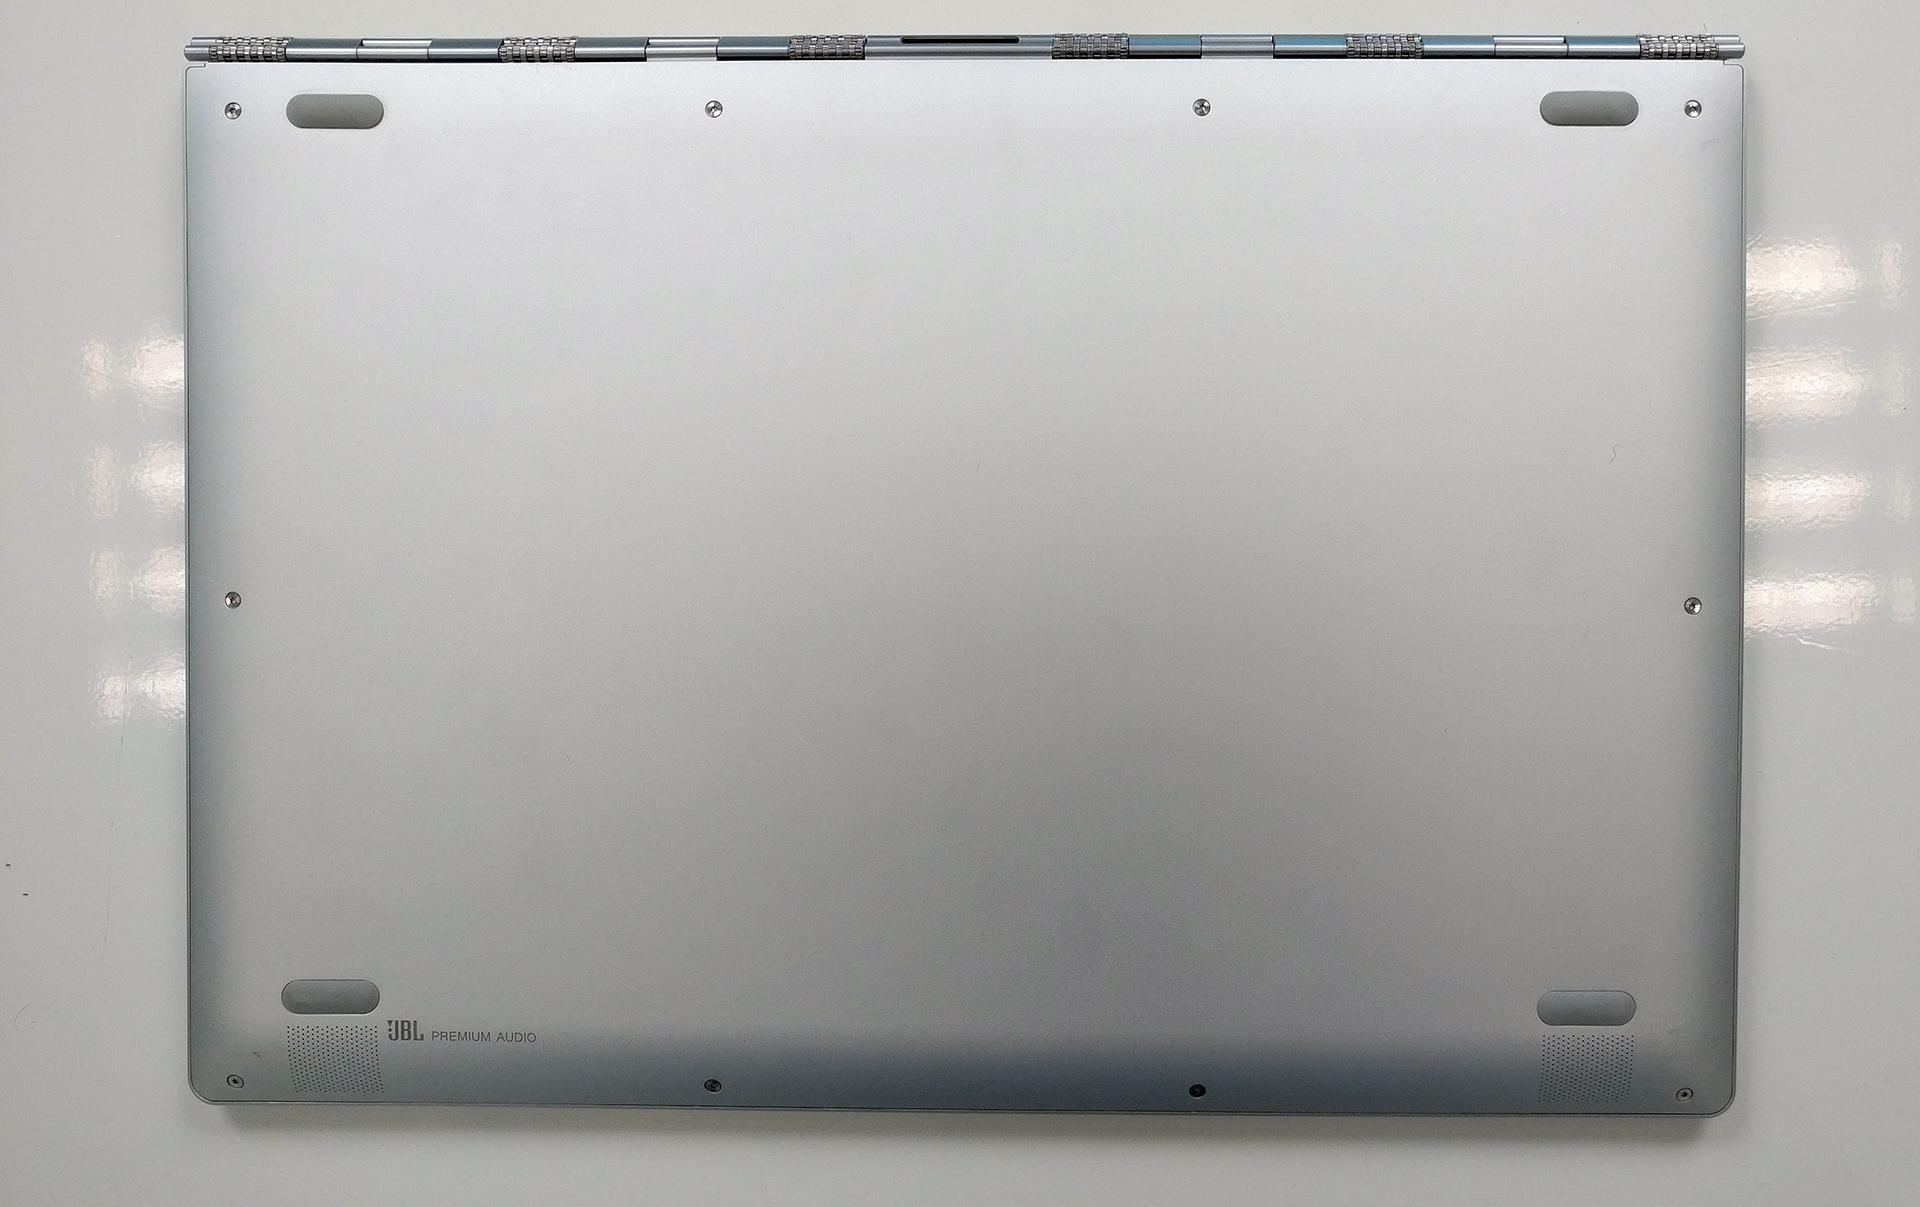 Inside Lenovo Yoga 910 – disassembly, internal photos and